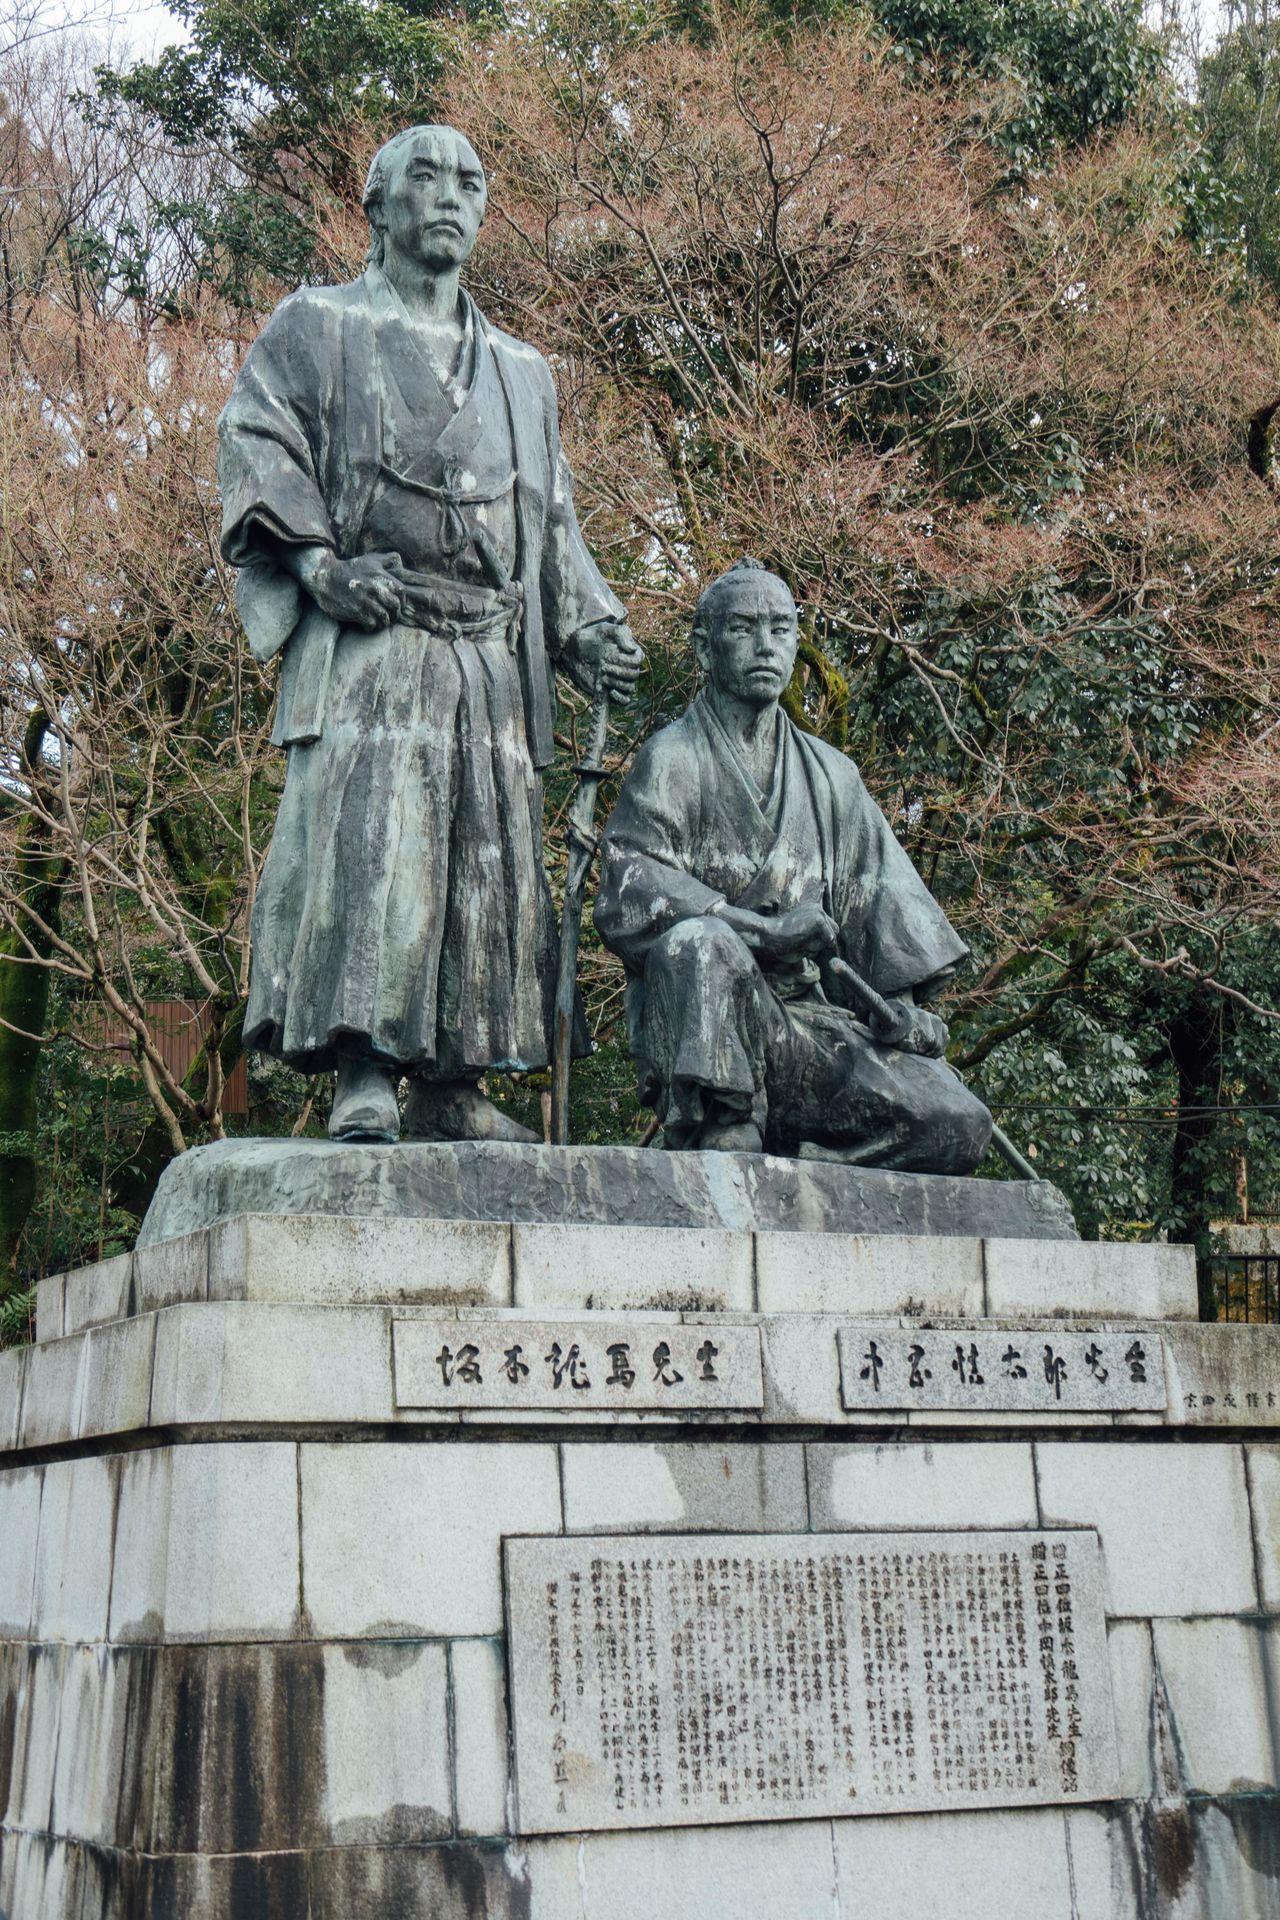 Maruyama Maruyama Park Kyoto Japan Statues Bronze Nakaoka Shintarō Sakamoto Ryoma